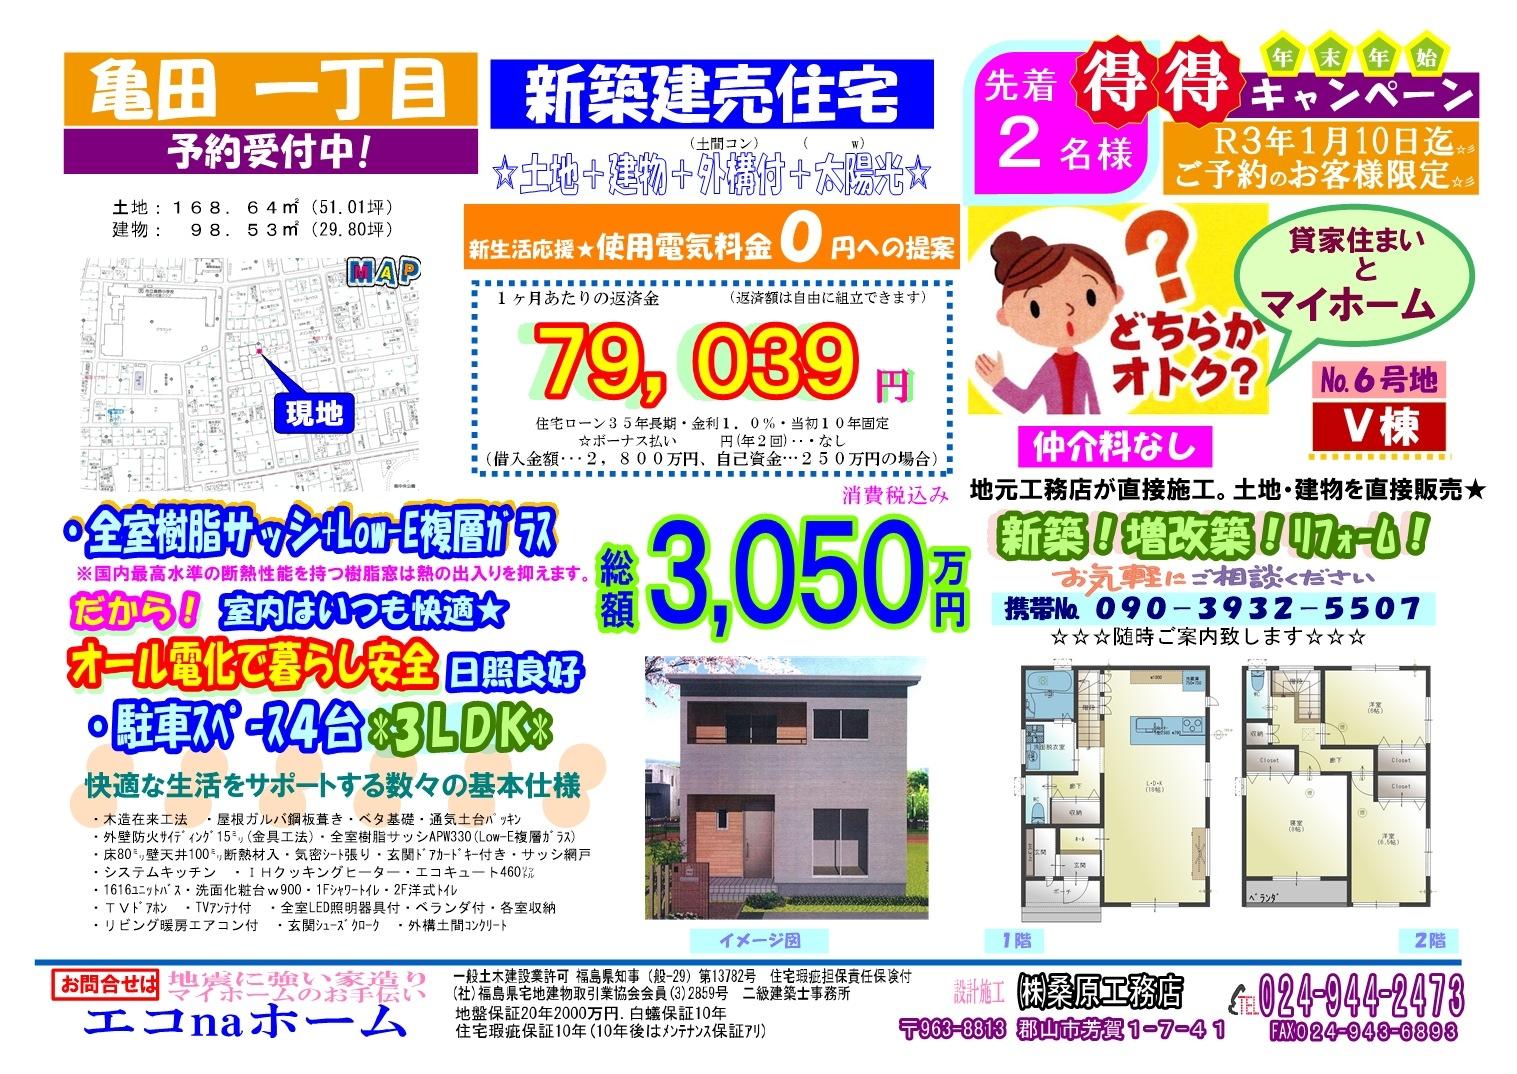 20201229 kameda_06_V.jpg